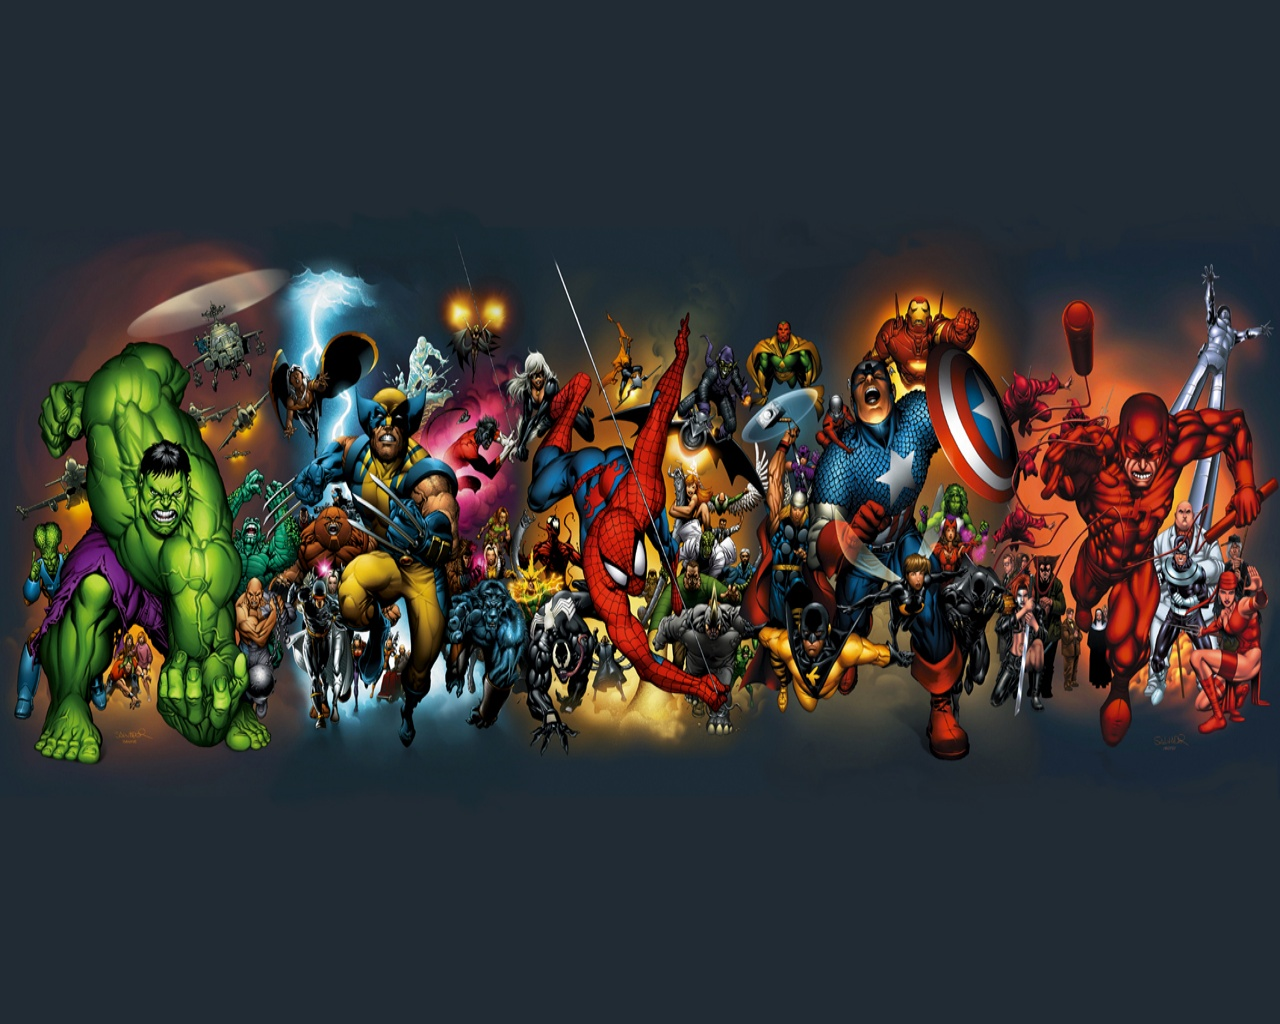 Marvel Comics 4   Comics Photography Desktop Wallpapers 3967 Views 1280x1024